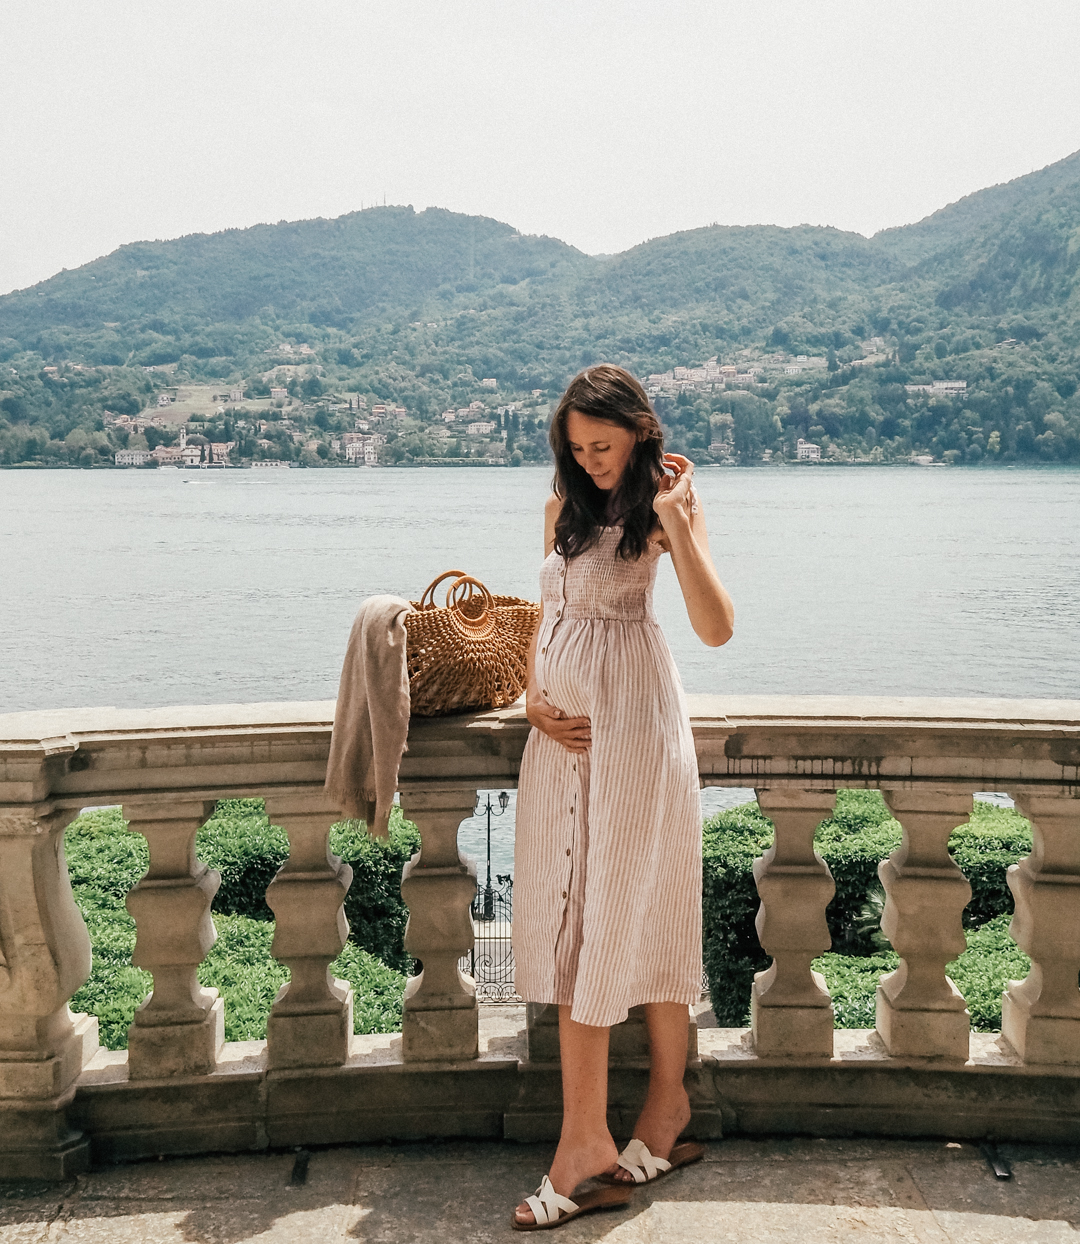 What to do in Lake Como - visit Villa Carlotta